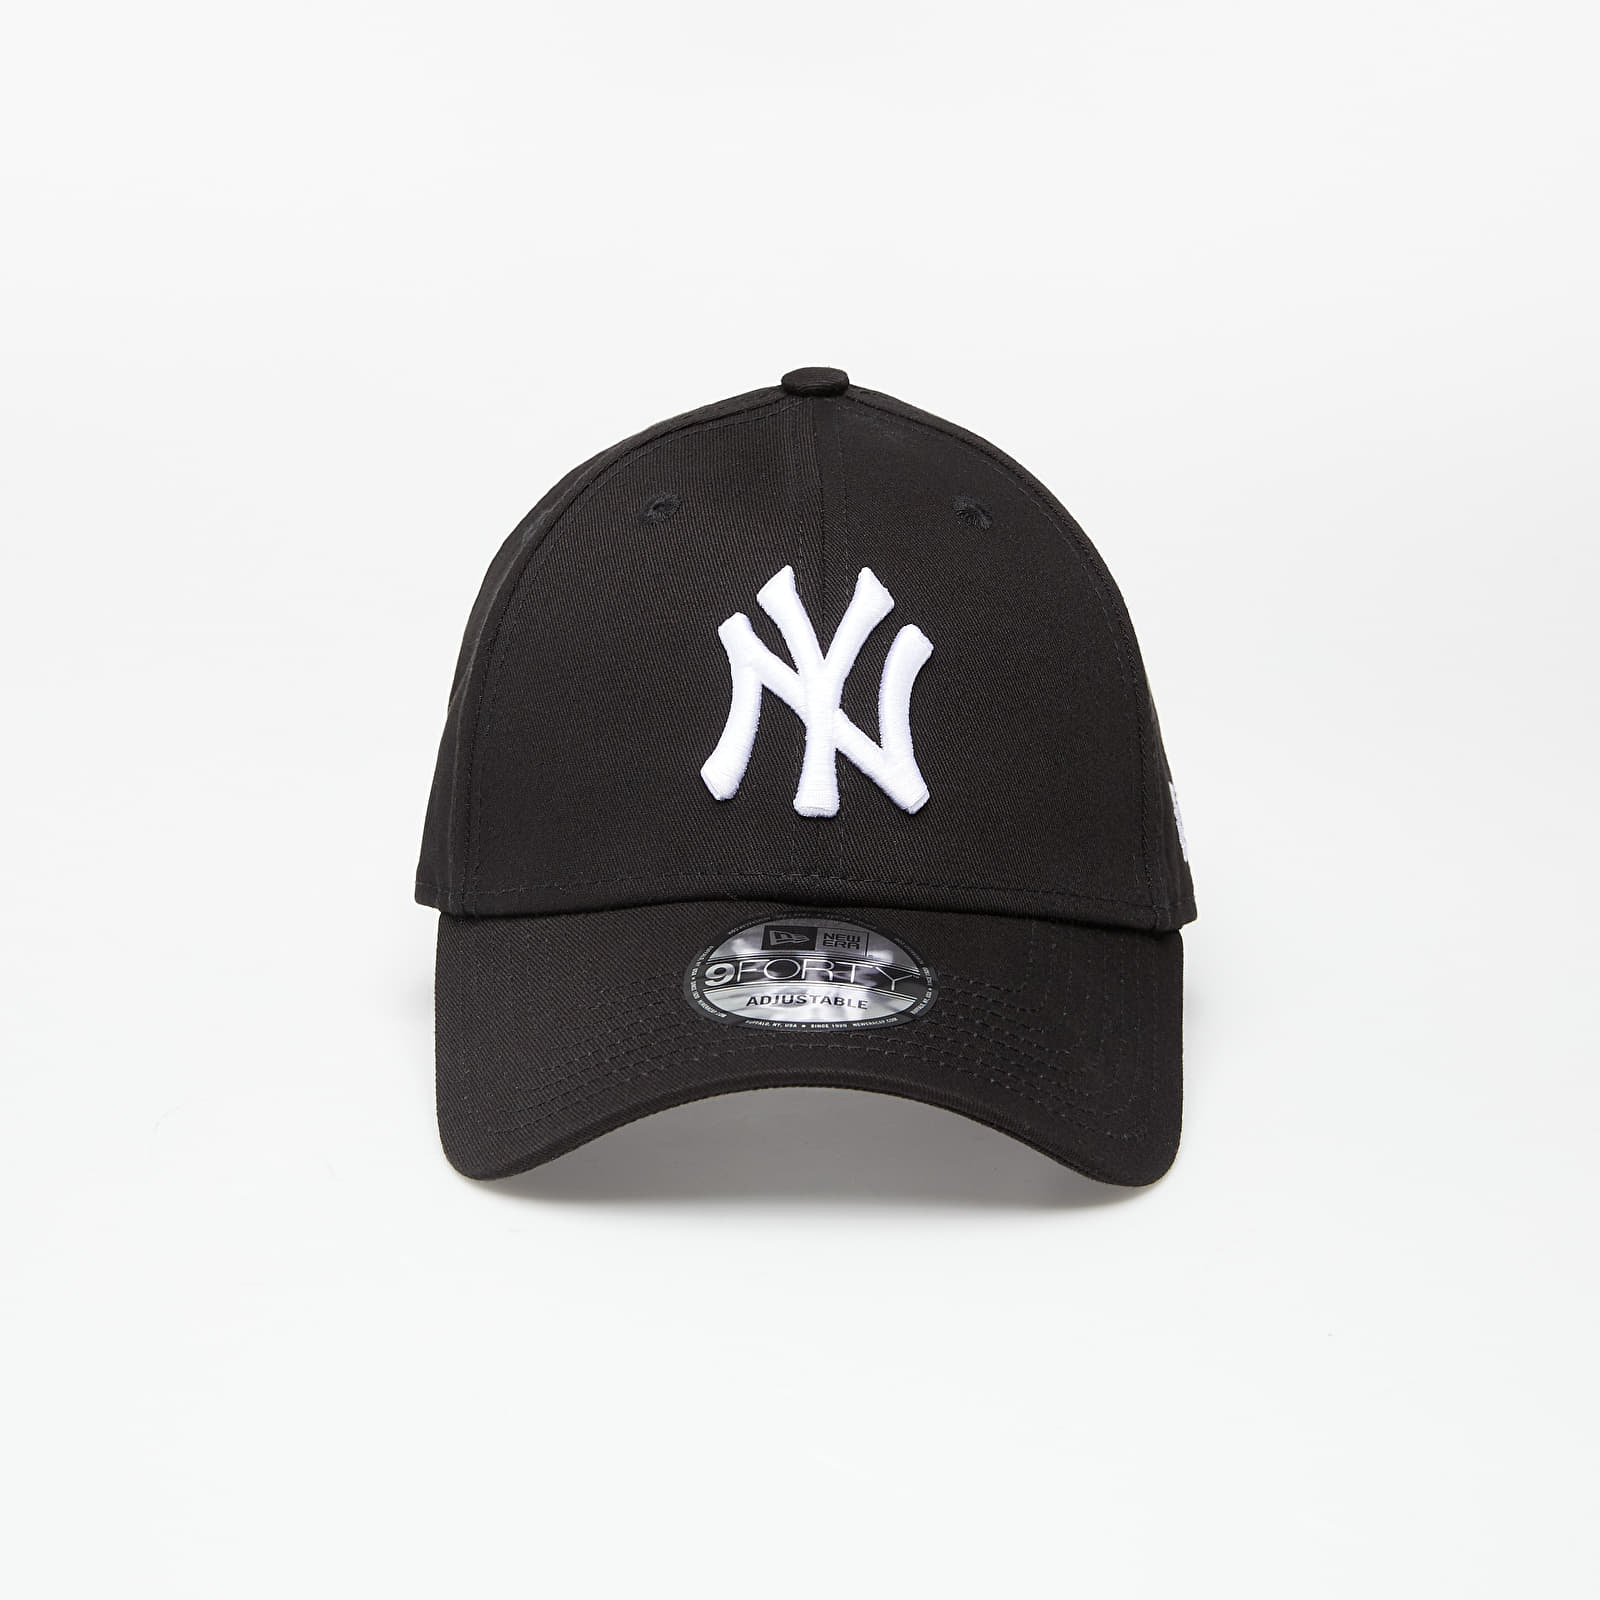 New Era Cap 9Forty Mlb League Basic New York Yankees Black/ White EUR